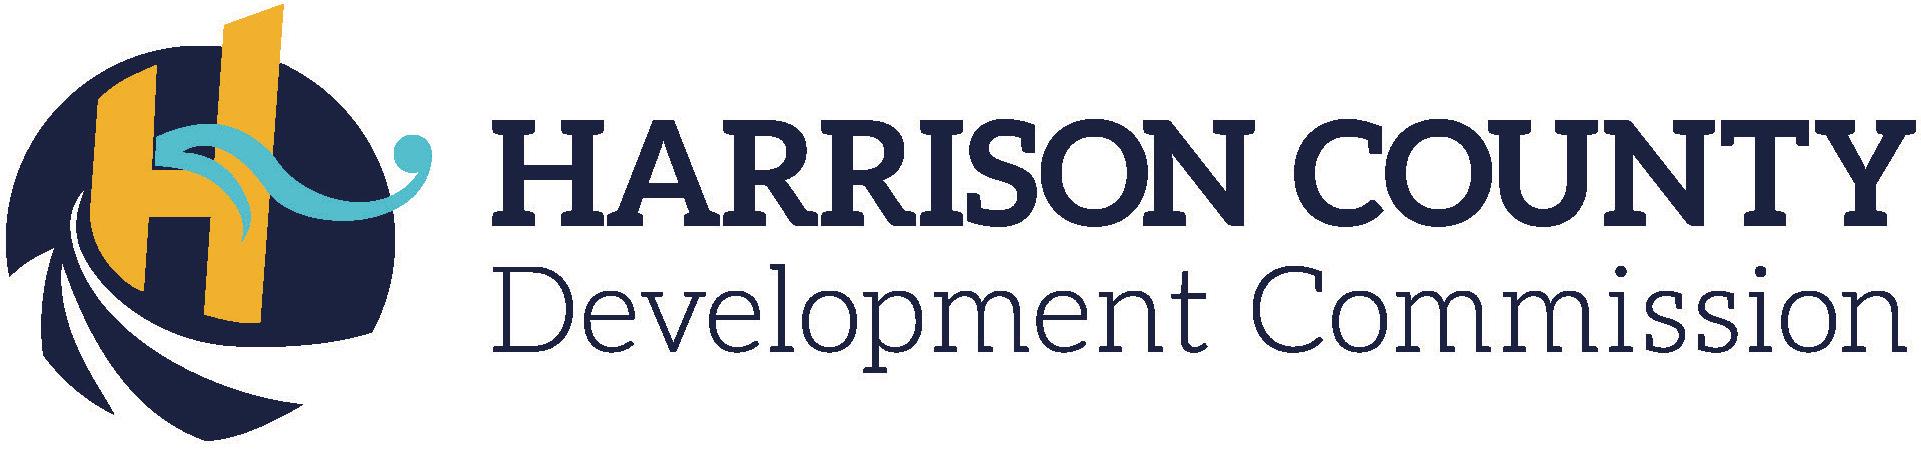 Harrison County Development Commission